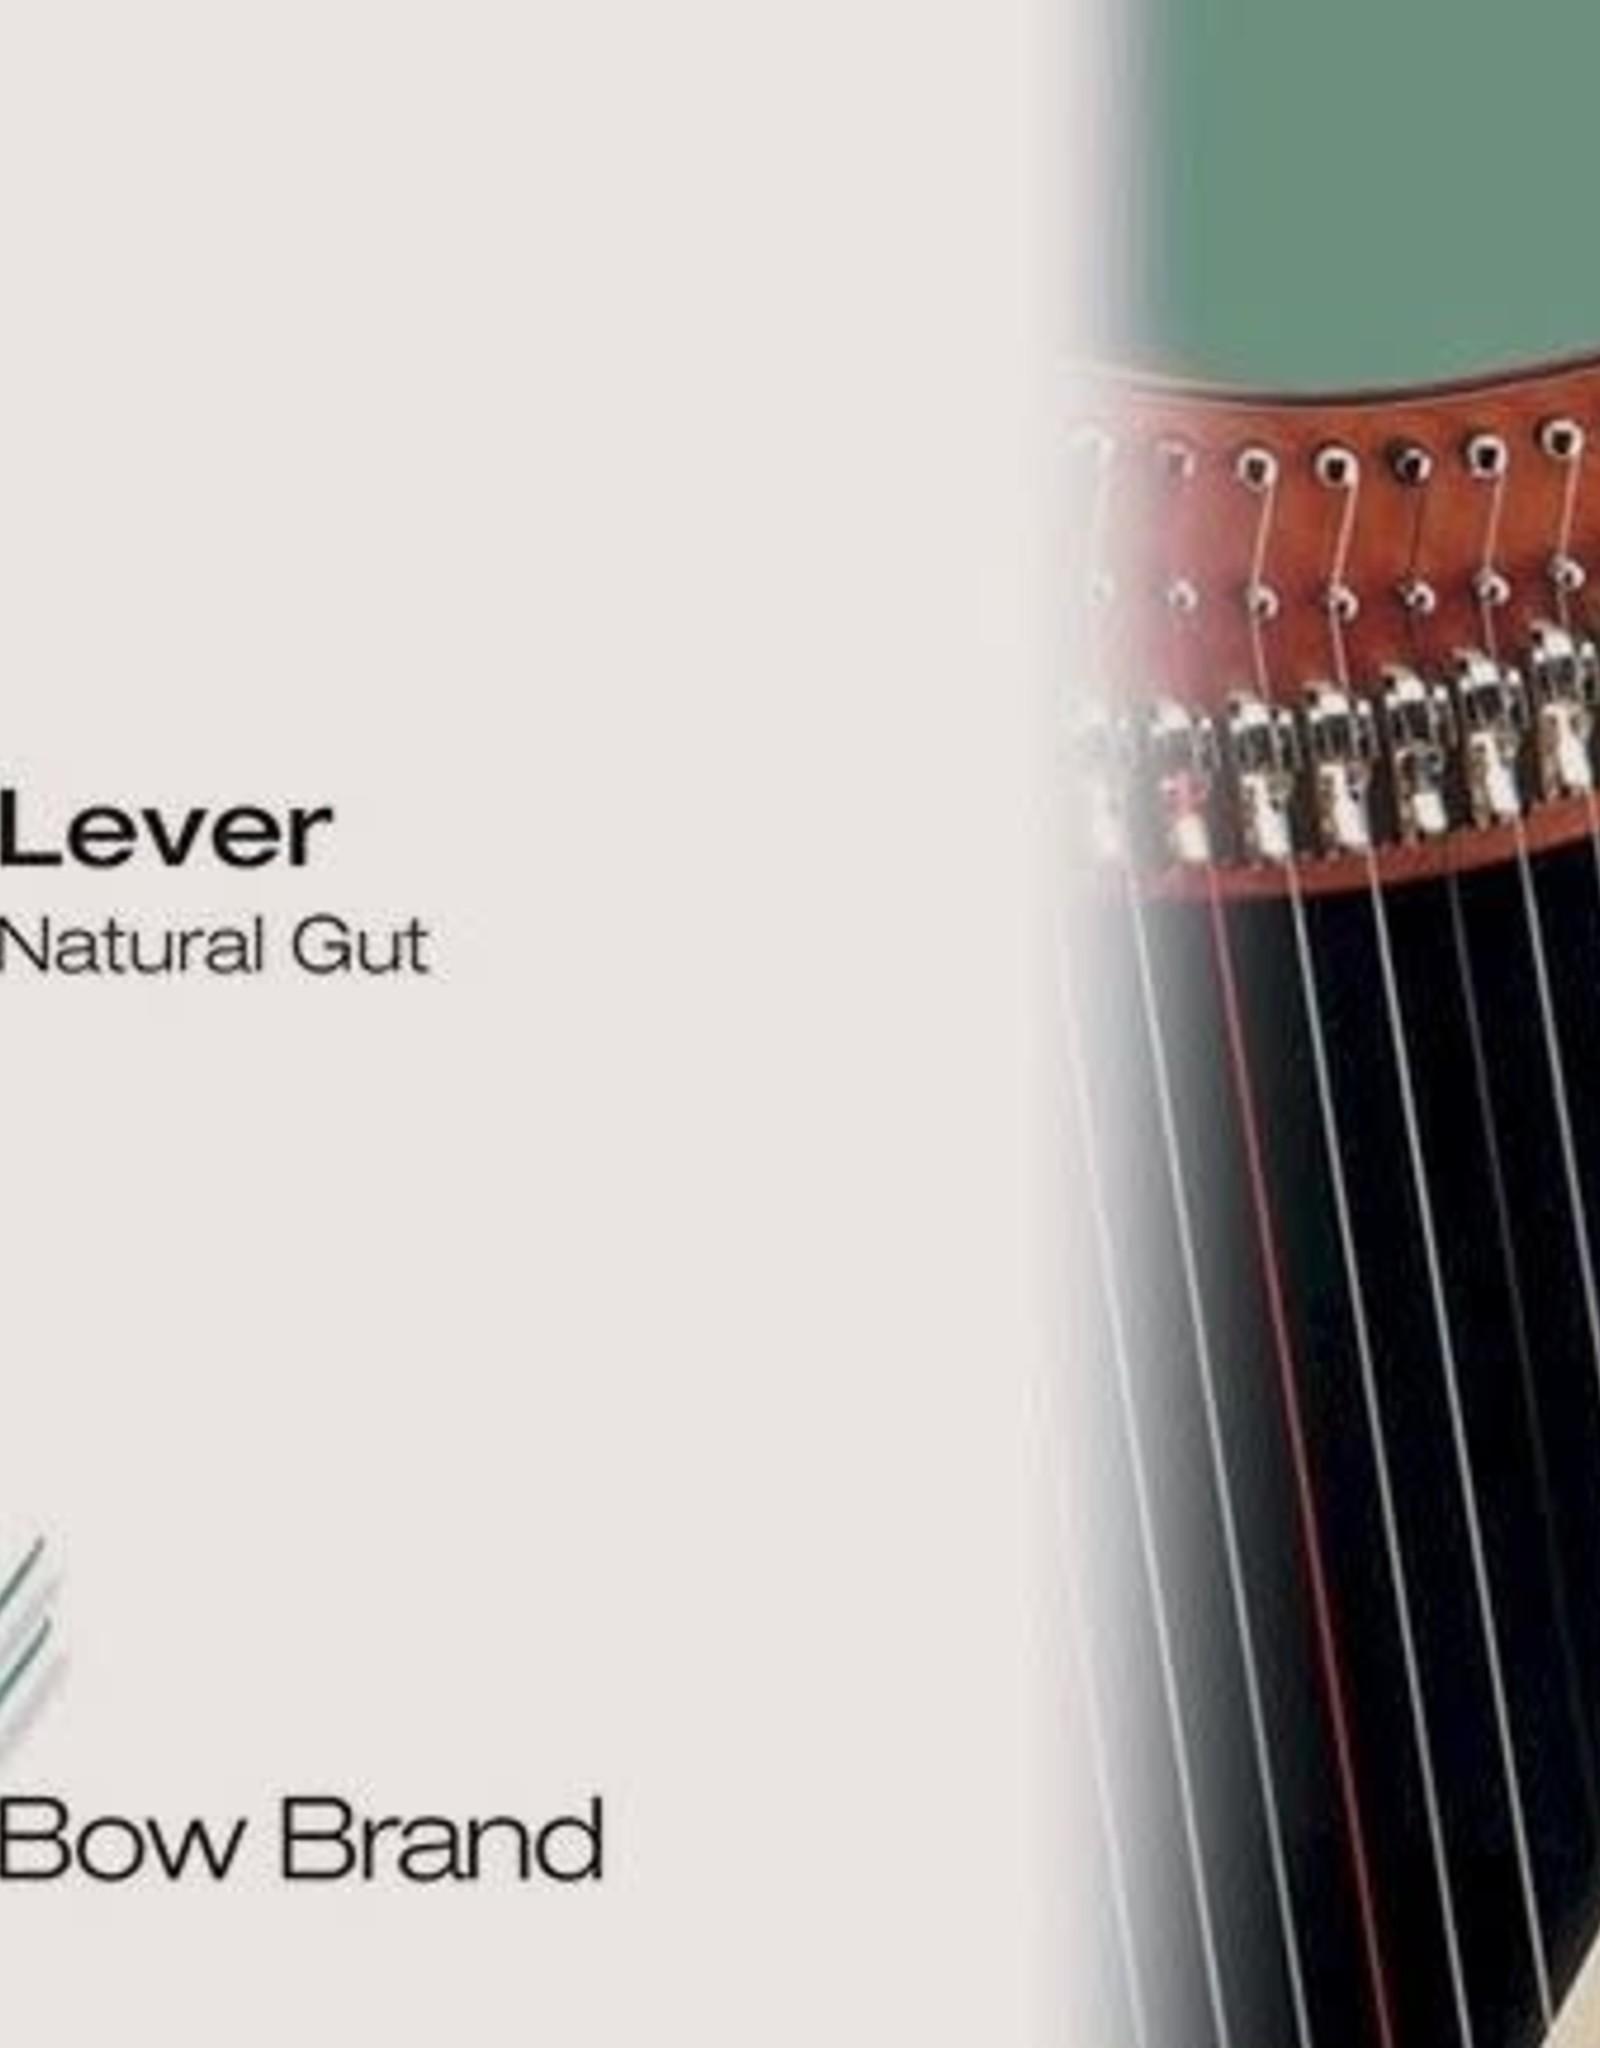 BOW BRAND  klep darm - lever GUT 27/4 sol